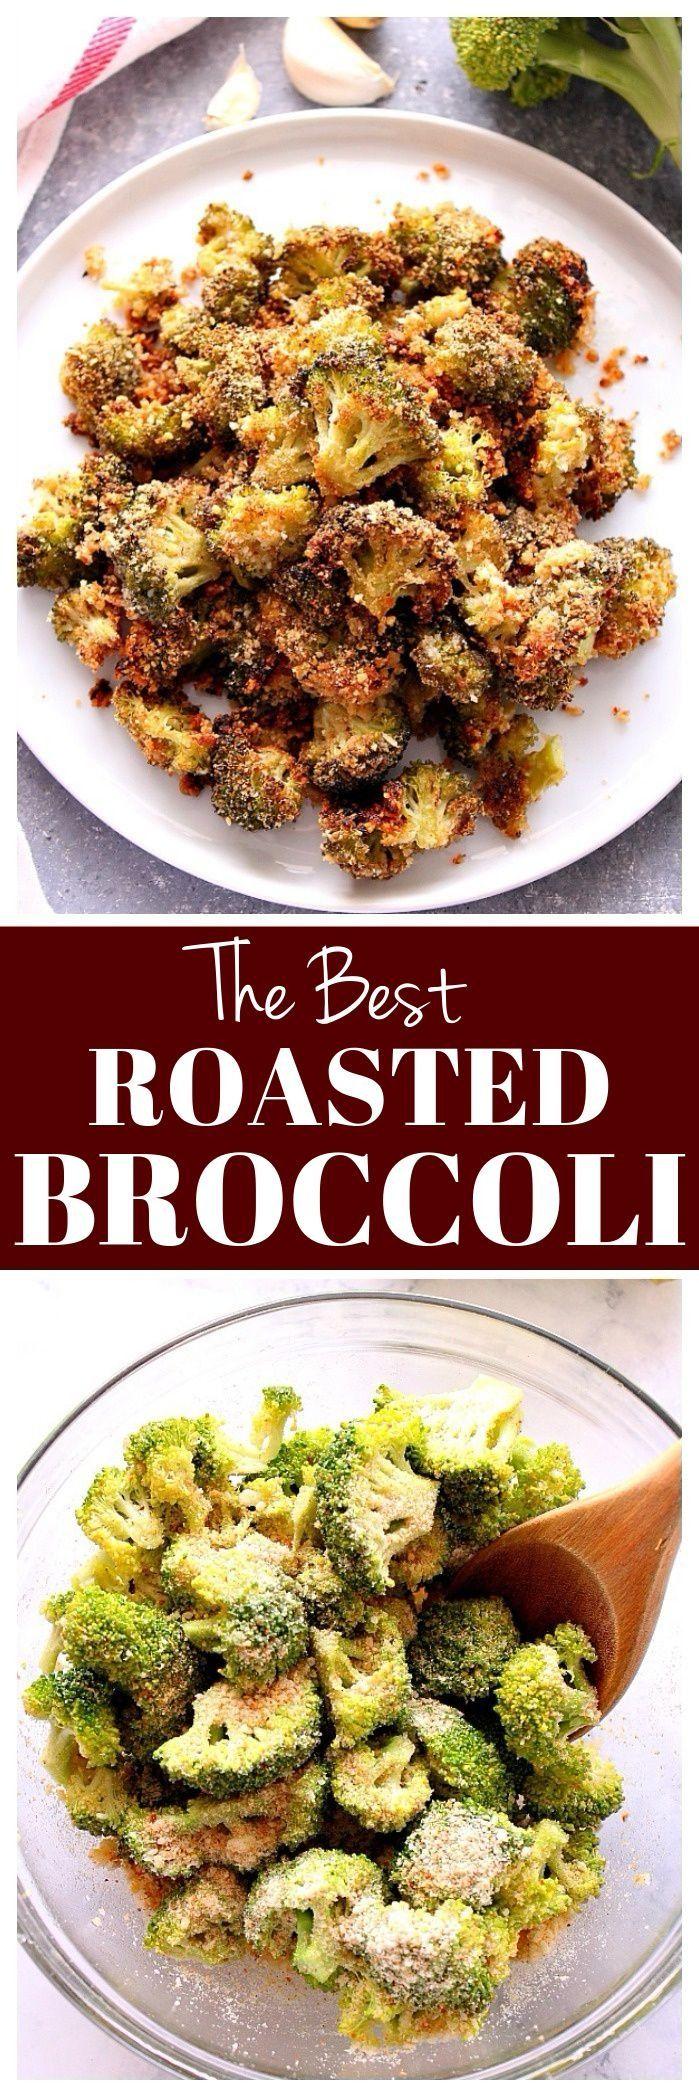 Garlic Parmesan Roasted Broccoli Recipe - the best broccoli ever! Perfectly roasted broccoli with crunchy garlic Parmesan coating.